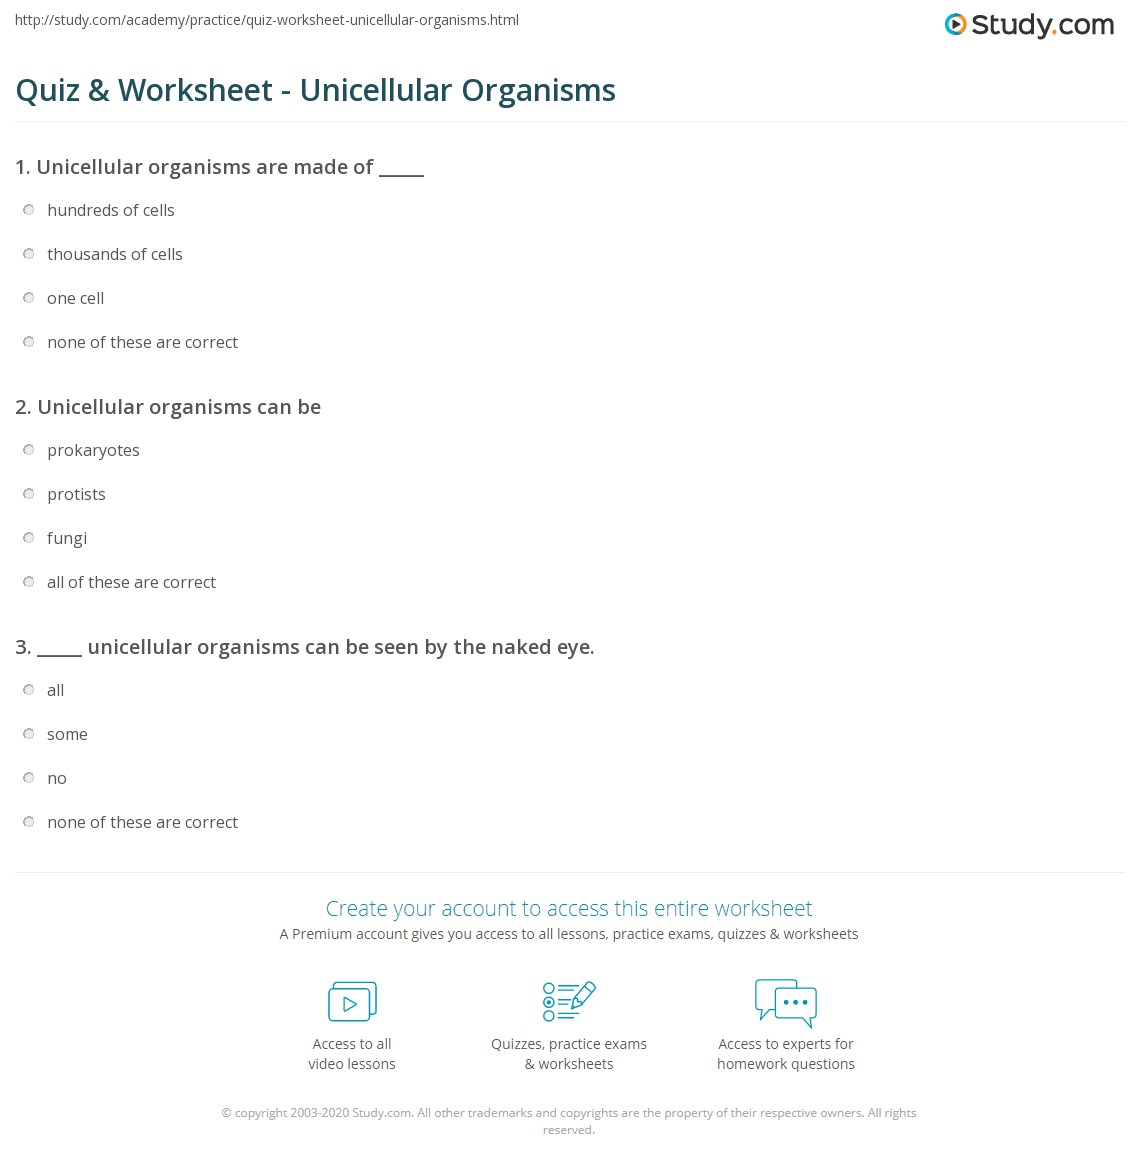 Quiz & Worksheet - Unicellular Organisms | Study.com